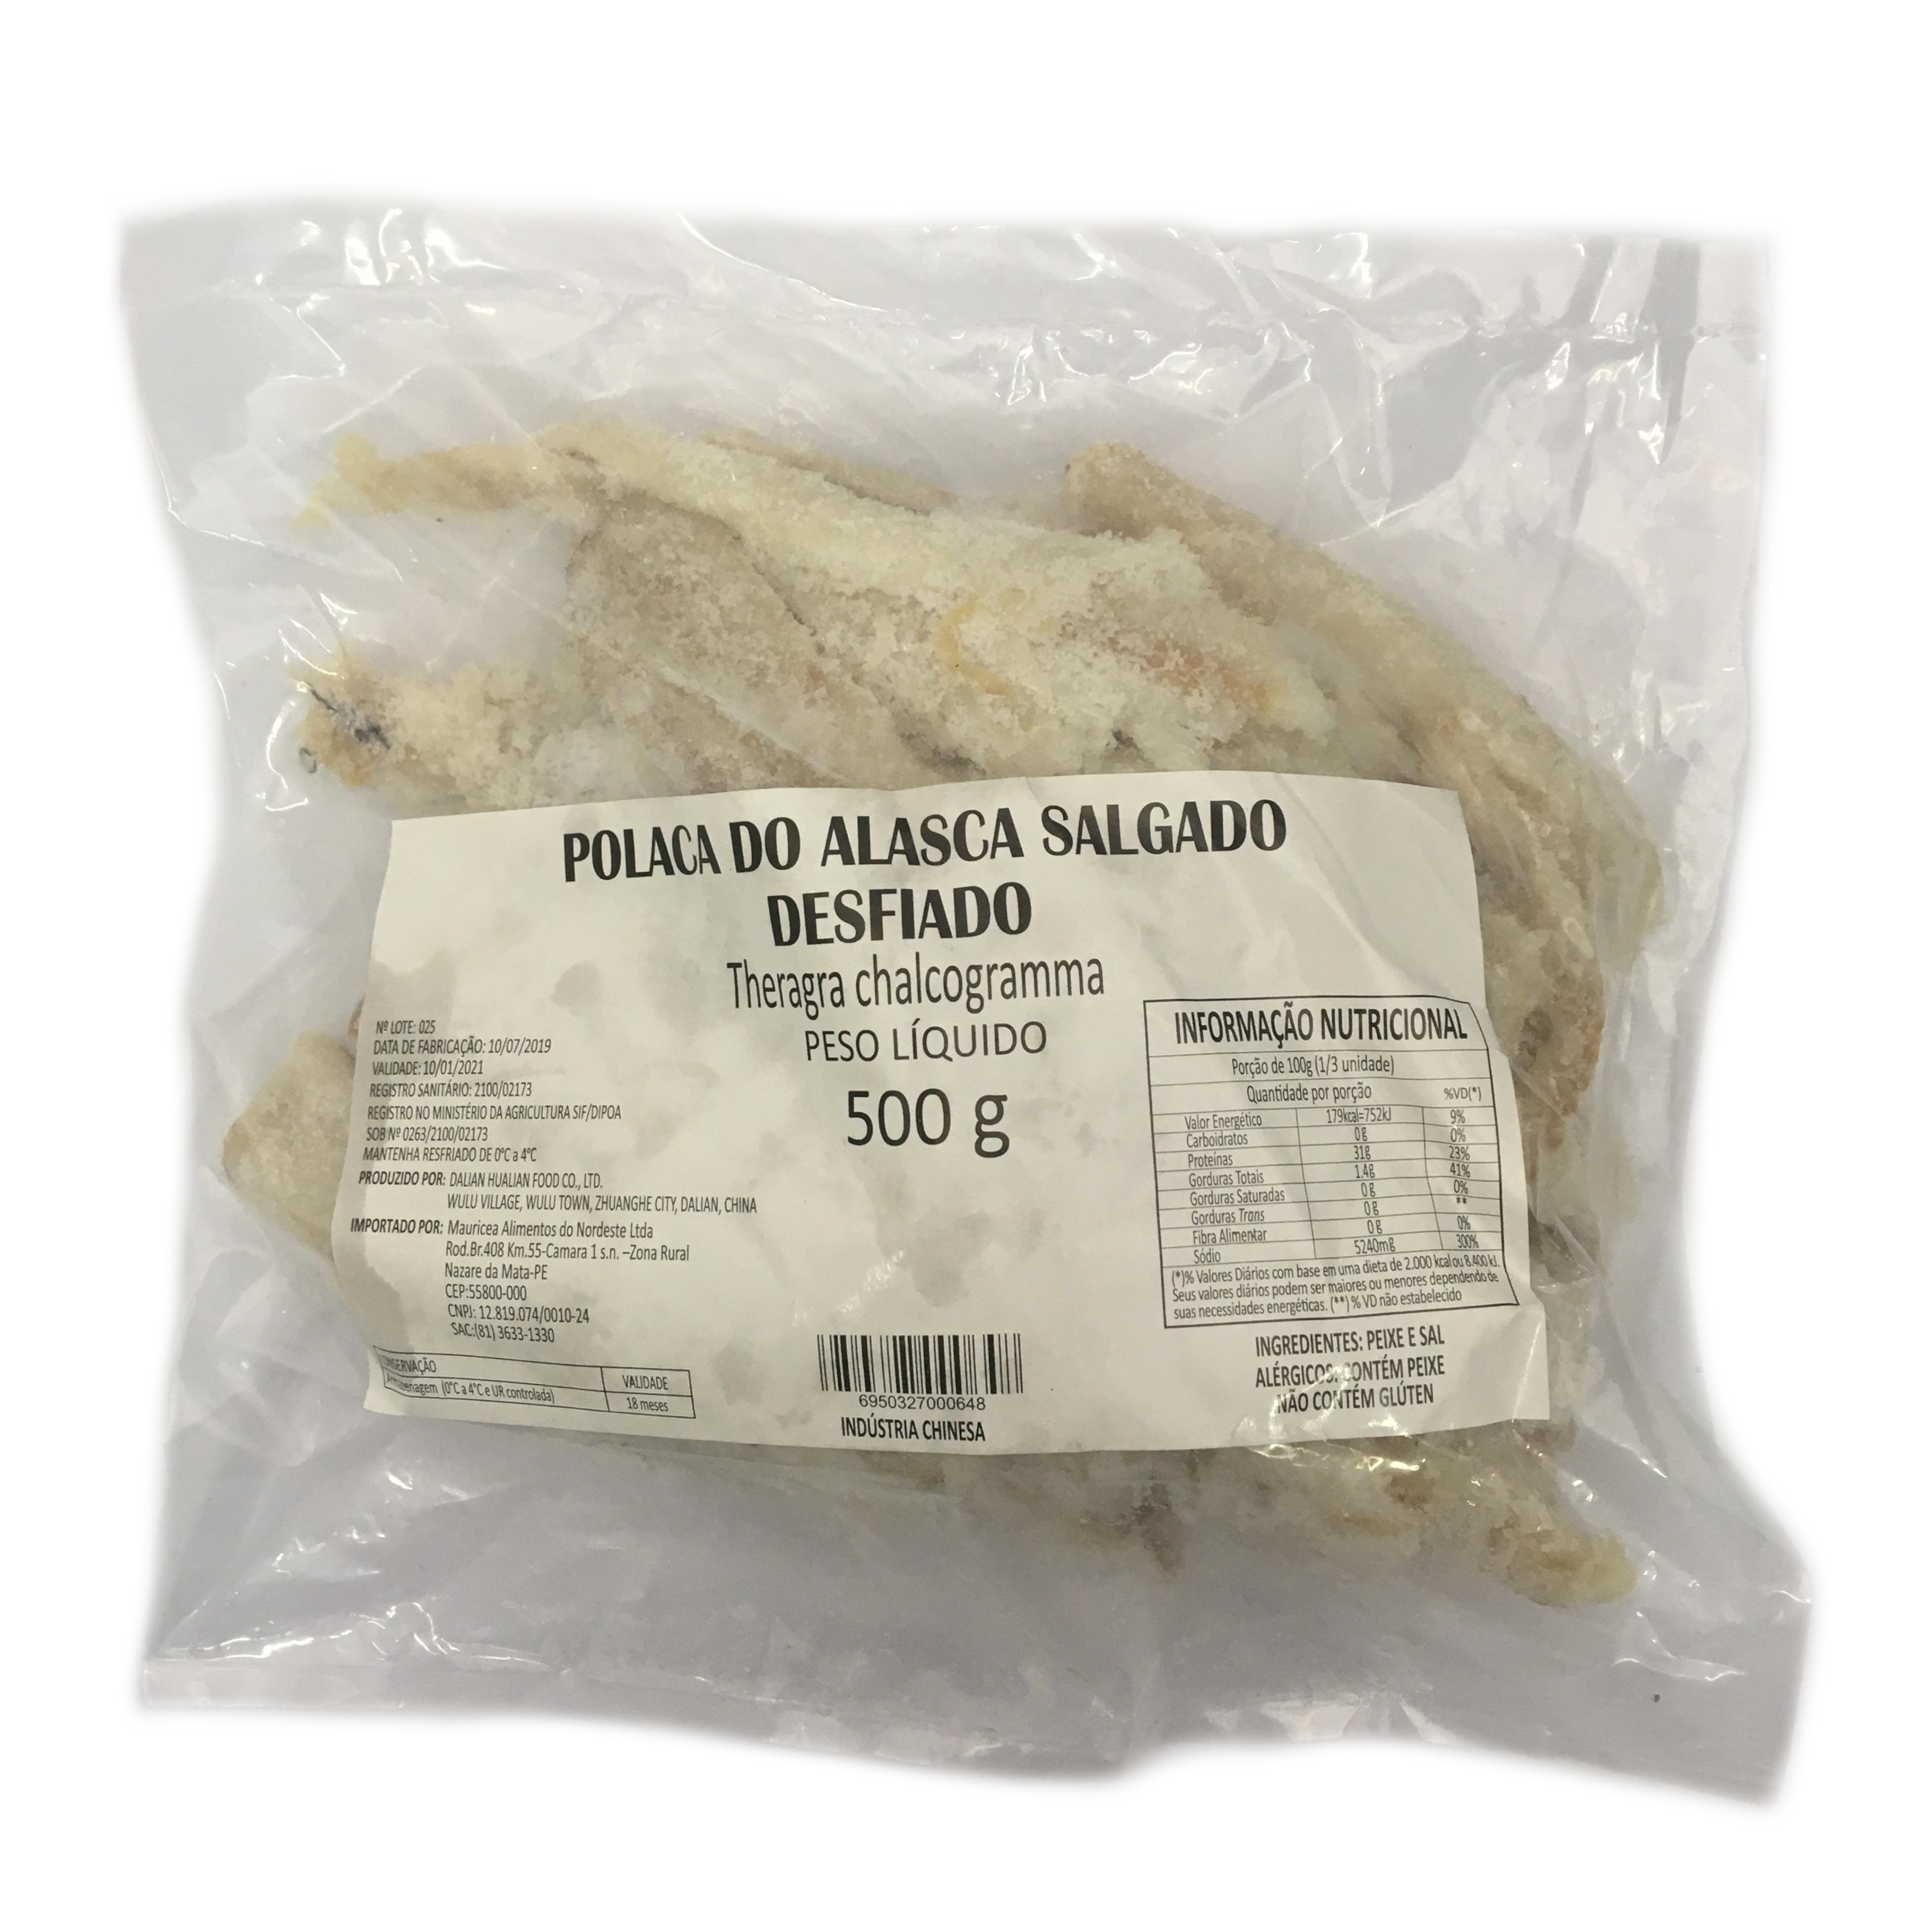 Polaca Peixe Tipo Bacalhau Salgado PAC 500G